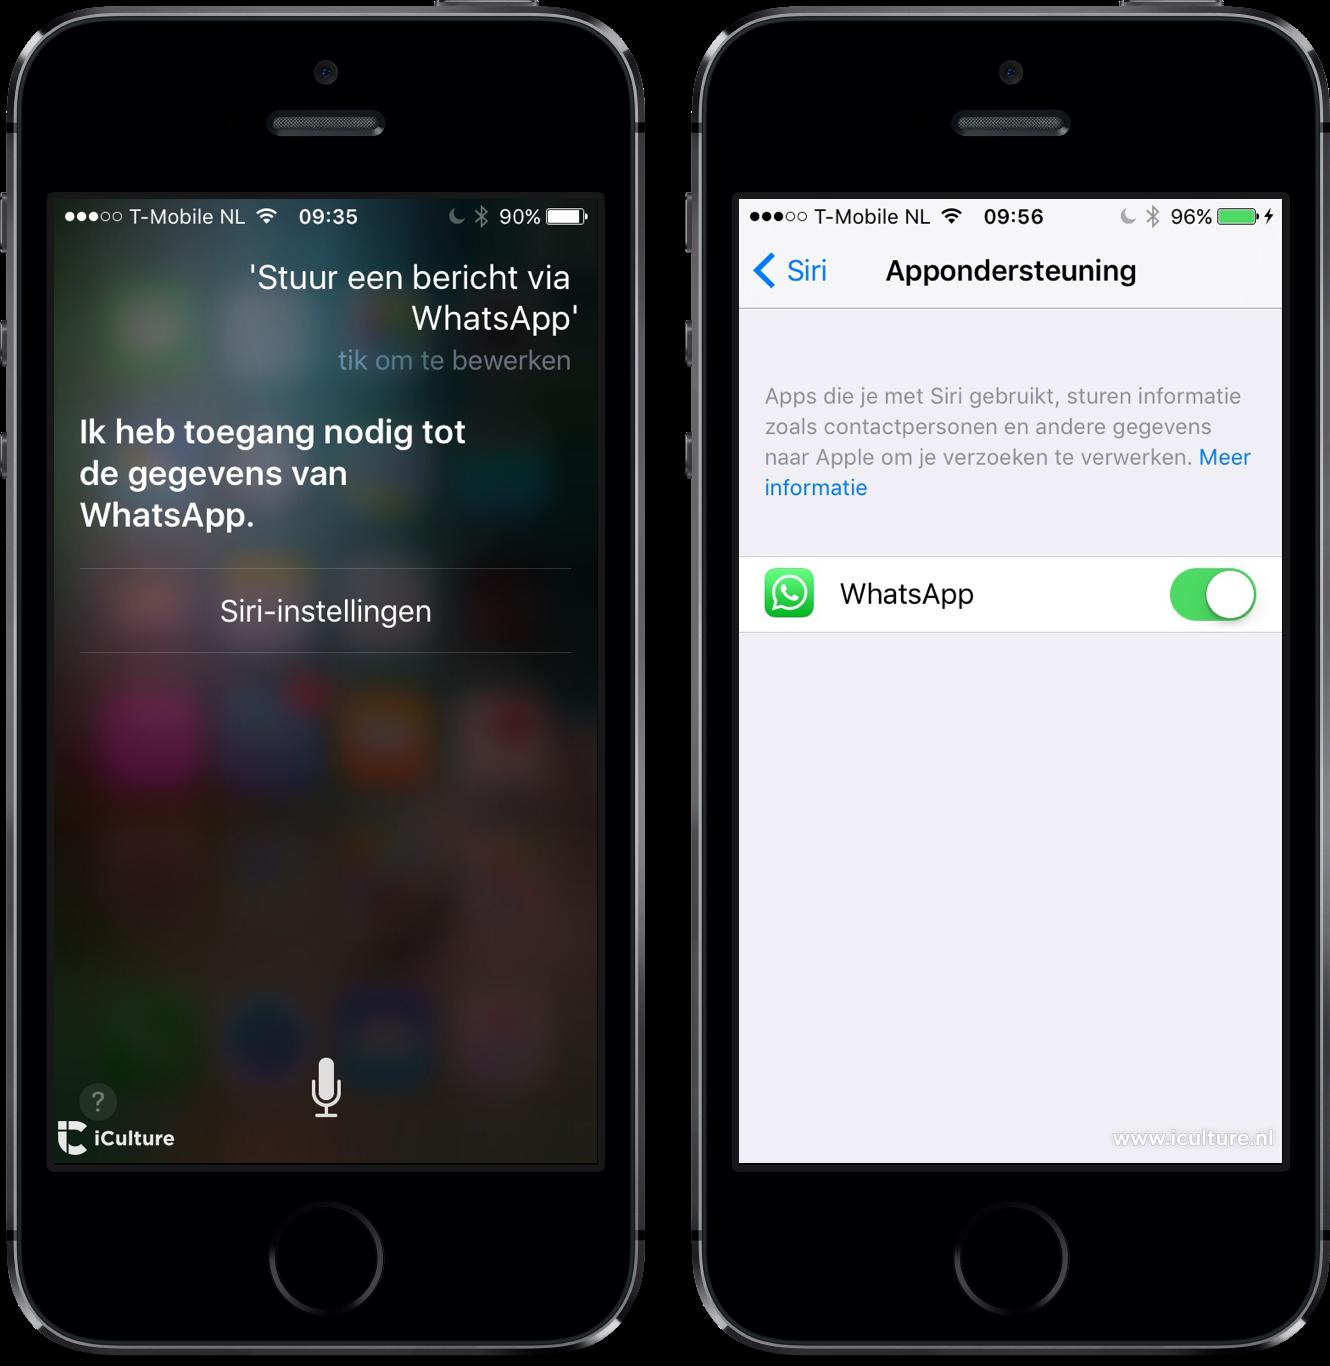 WhatsApp met Siri instellen.